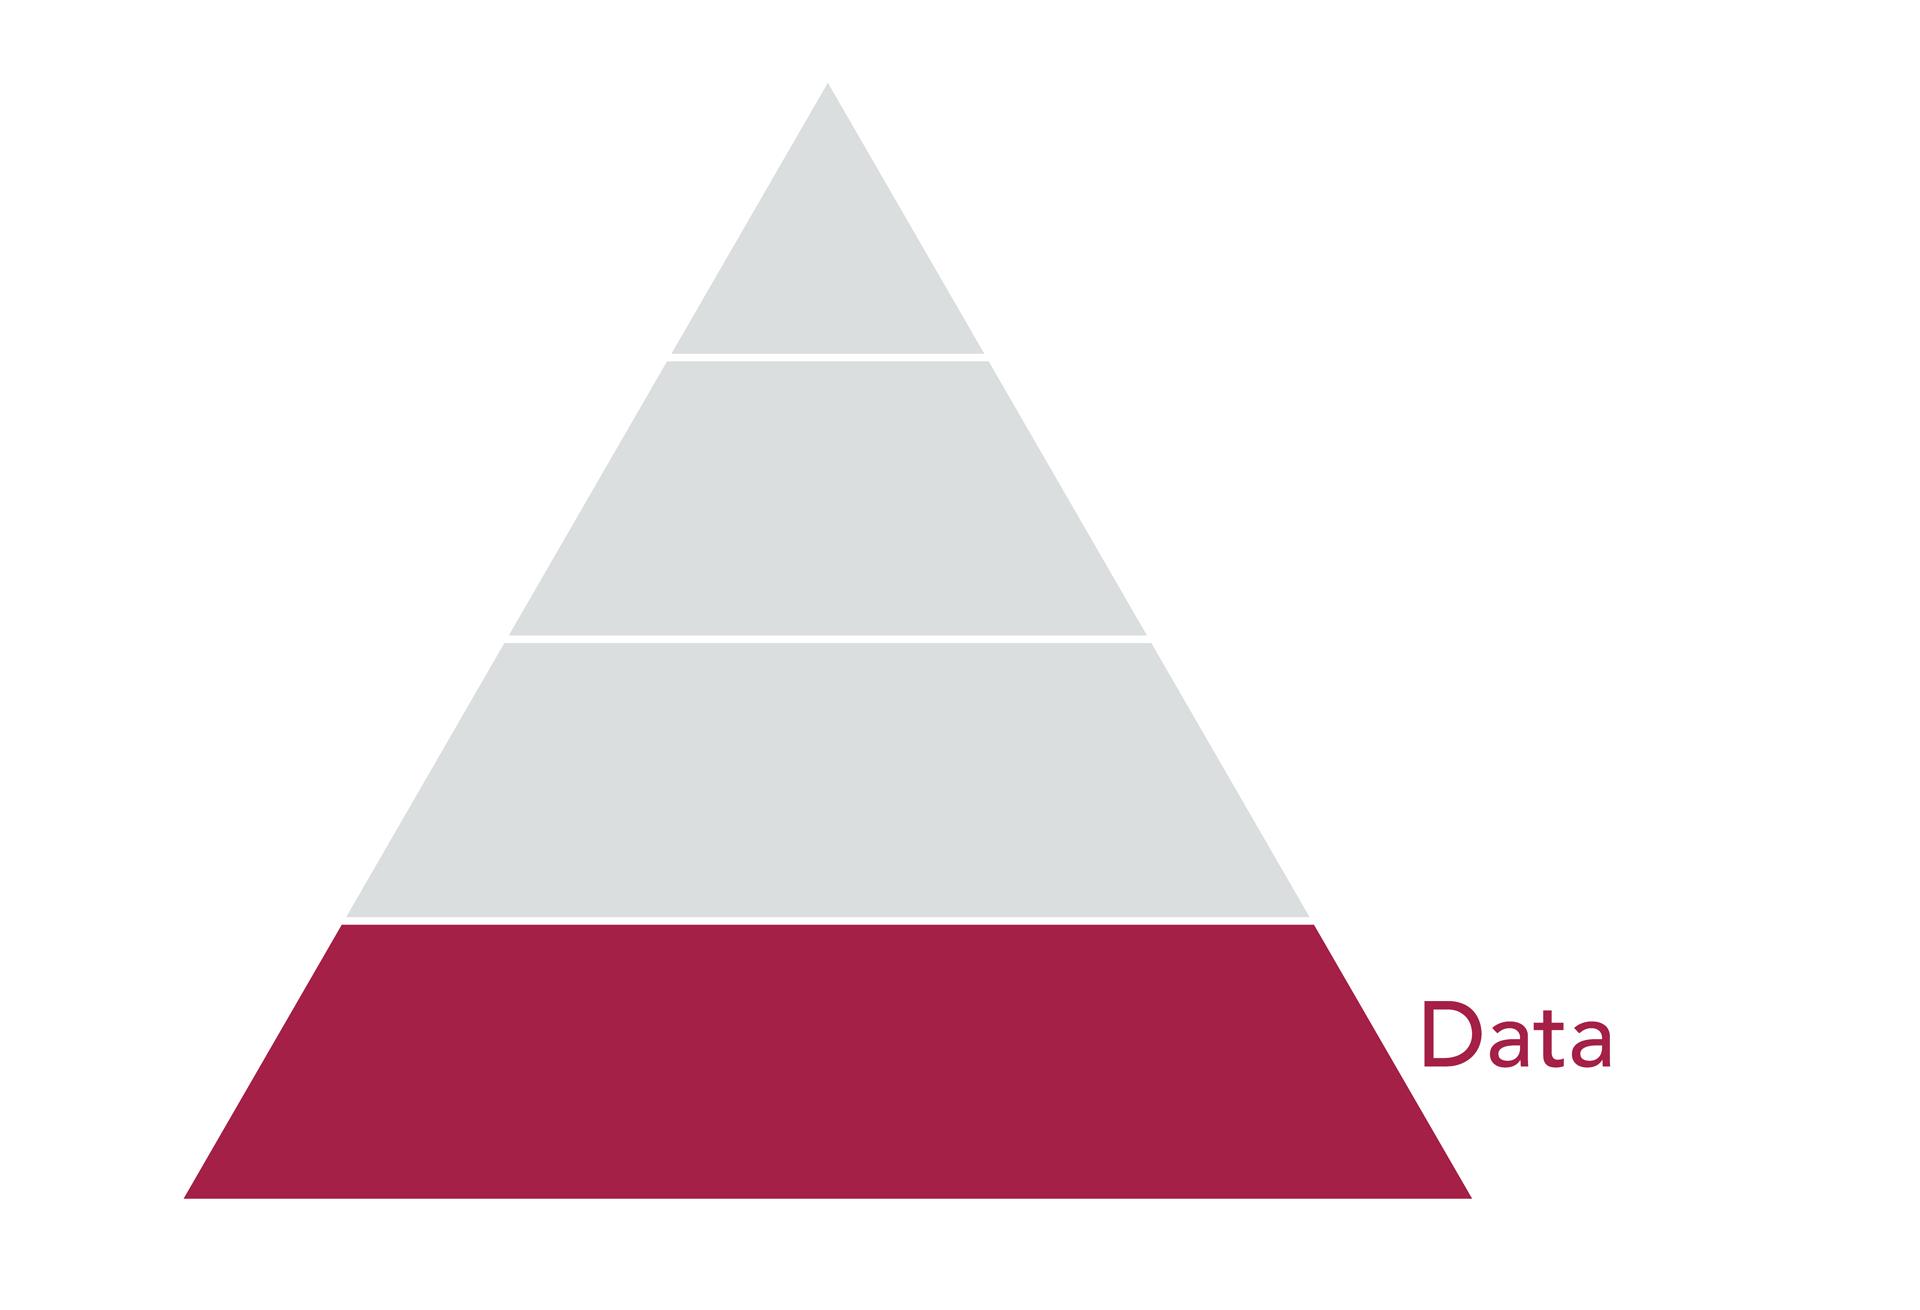 Data Pyramid, data layer.